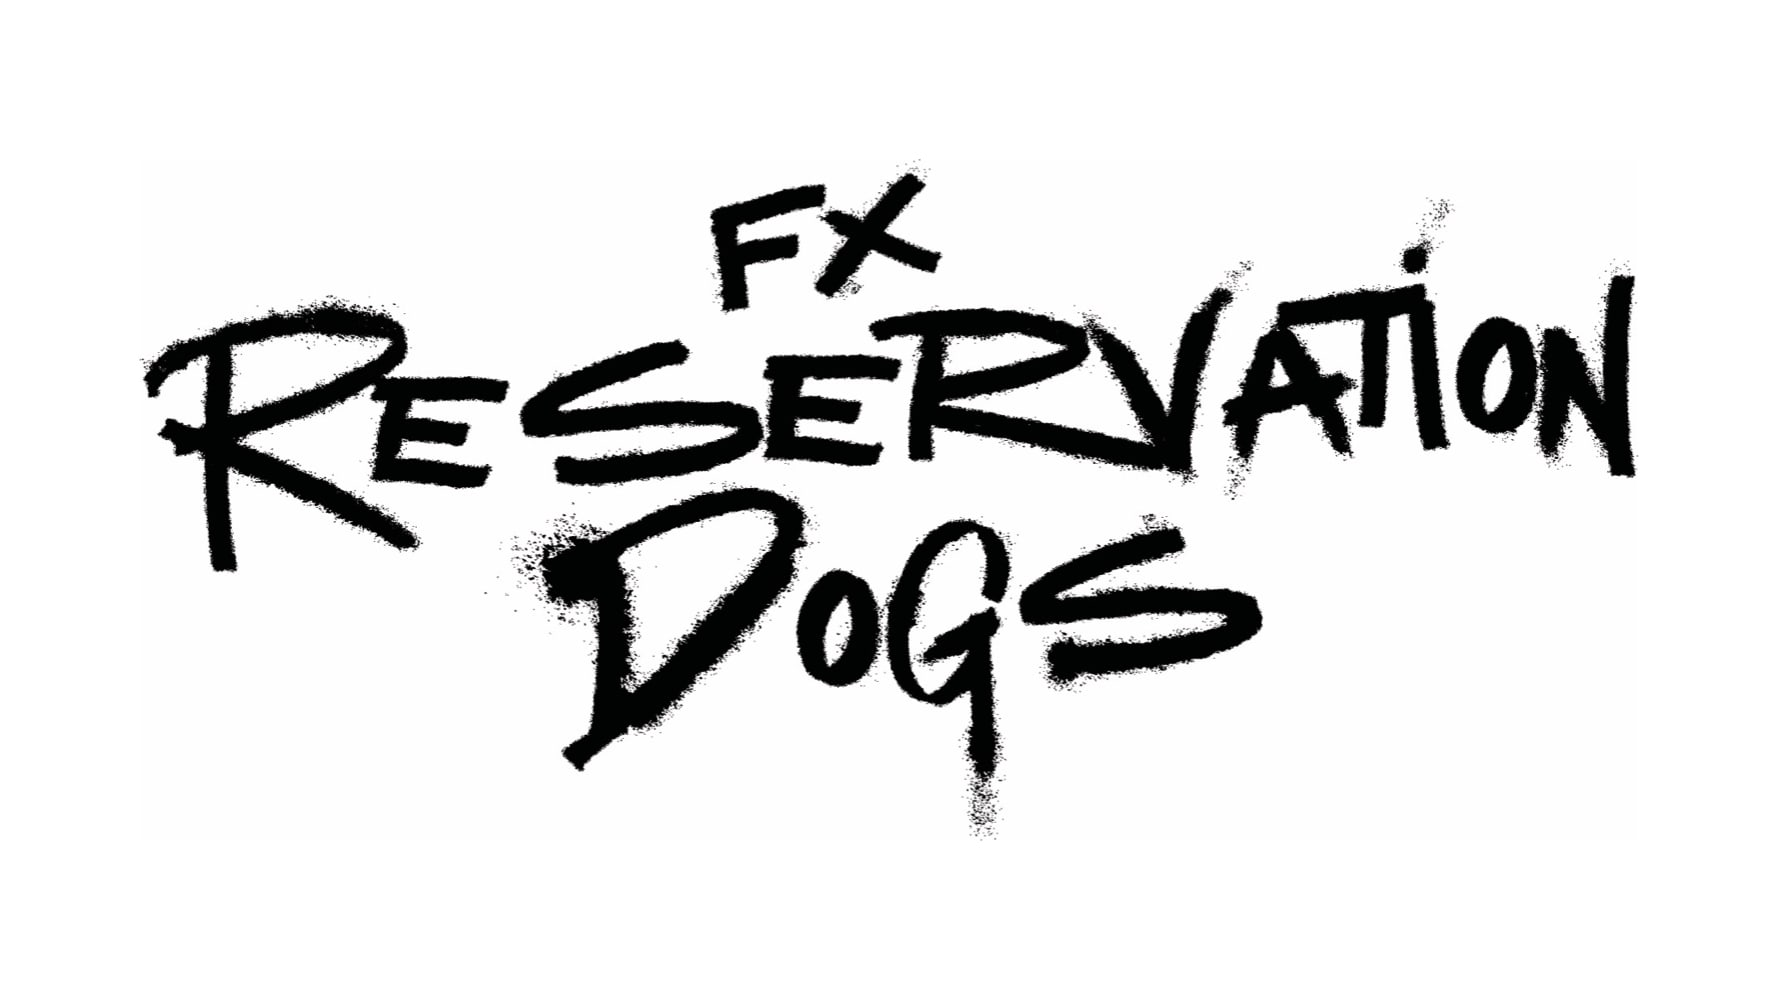 Reservation Dogs Logo